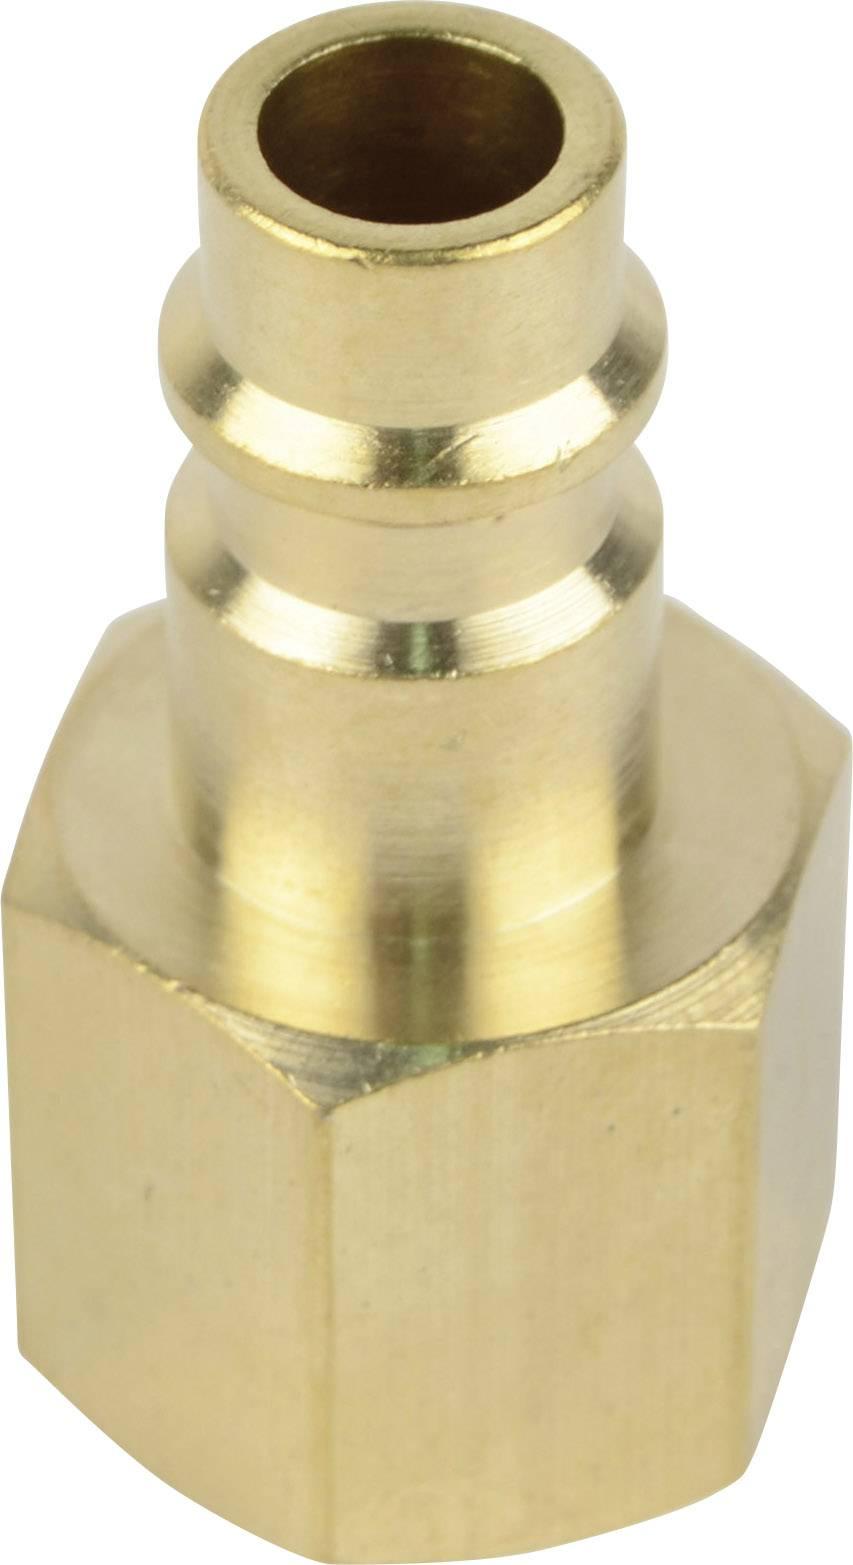 Y Stück 8 mm Druckluft Messing Stecknippel